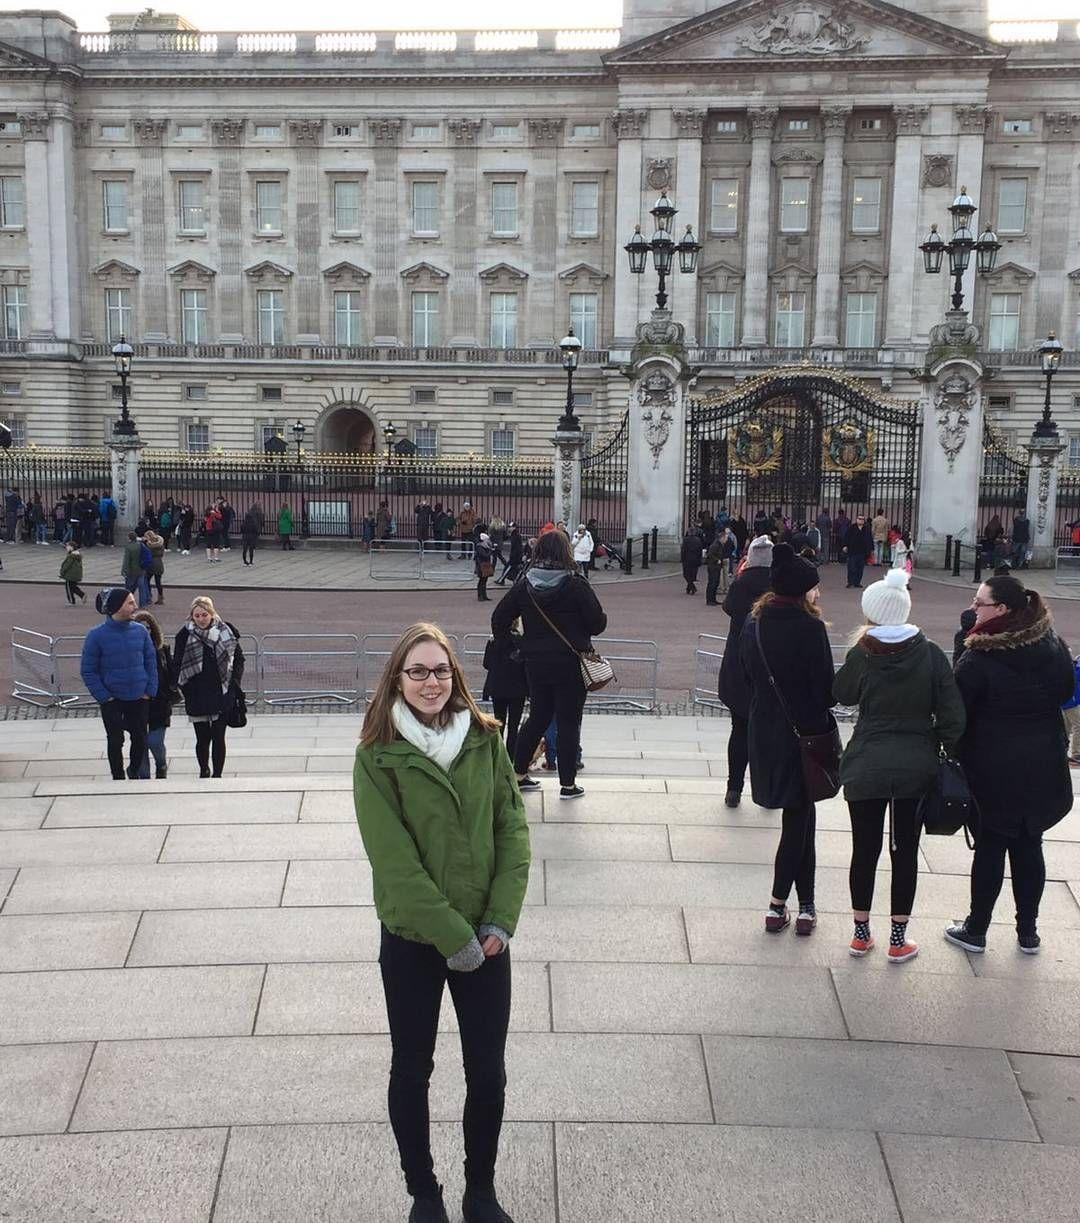 London  #Buckinghampalace#sightseeing#kurztrip#willzurück#kurzfürimmerbleiben by sarah.zmr